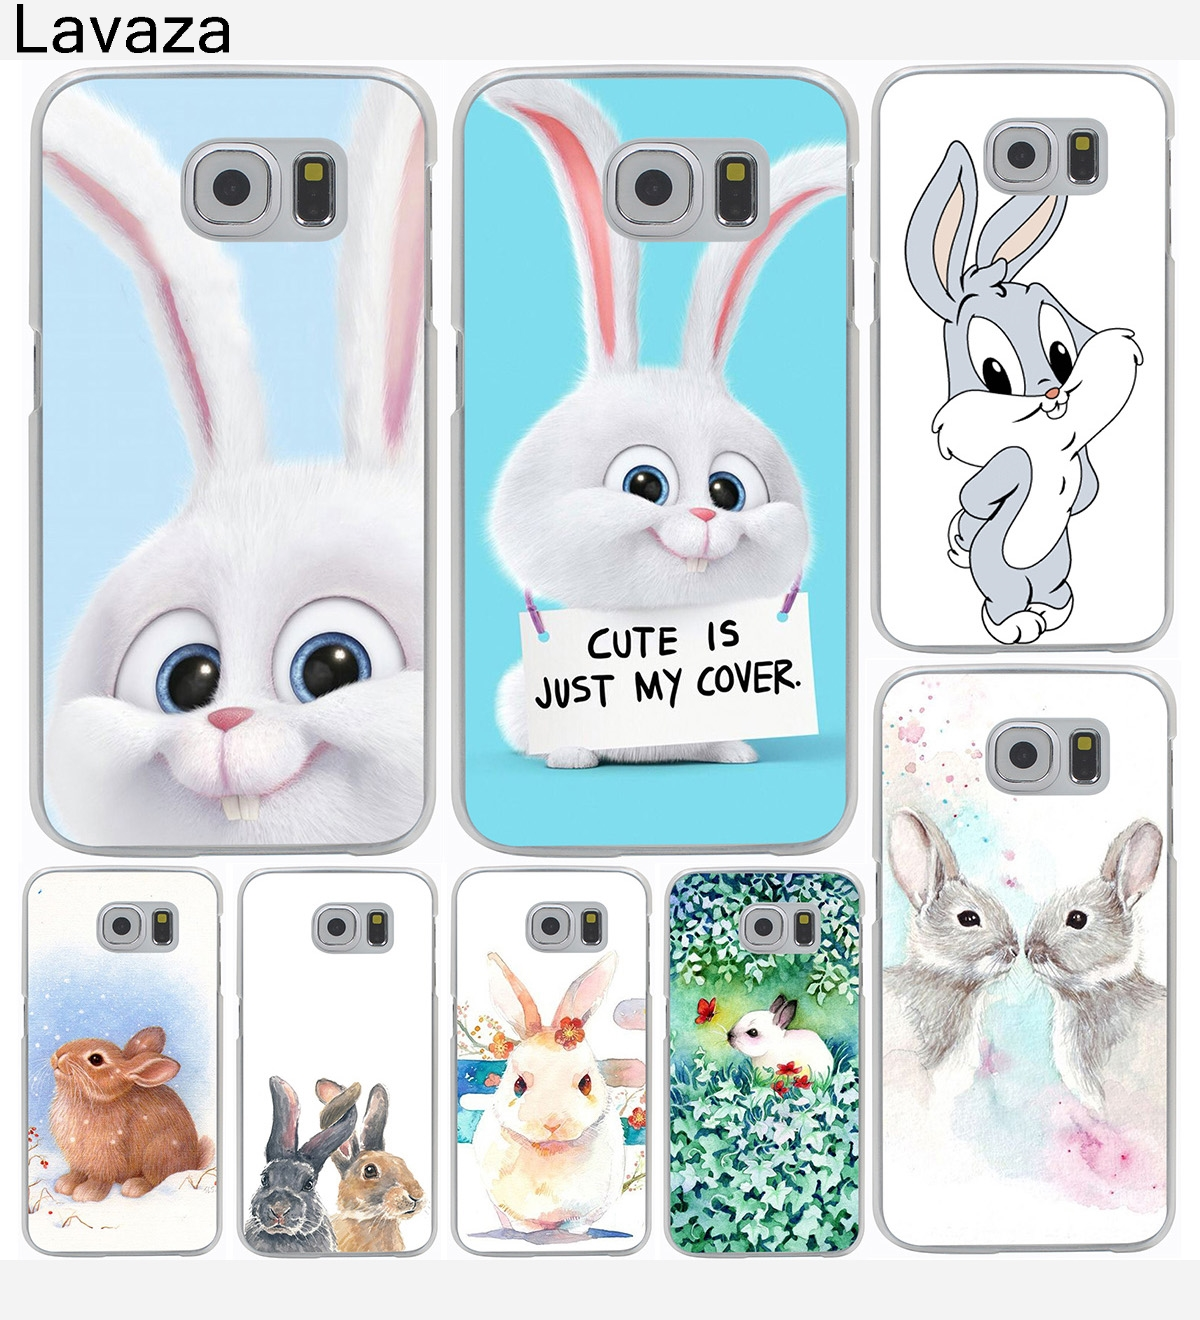 Animal Panda Tiger Owl Cartoon Hard Cover Case for Galaxy S3 S4 S5 & Mini S6 S7 S8 Edge Plus